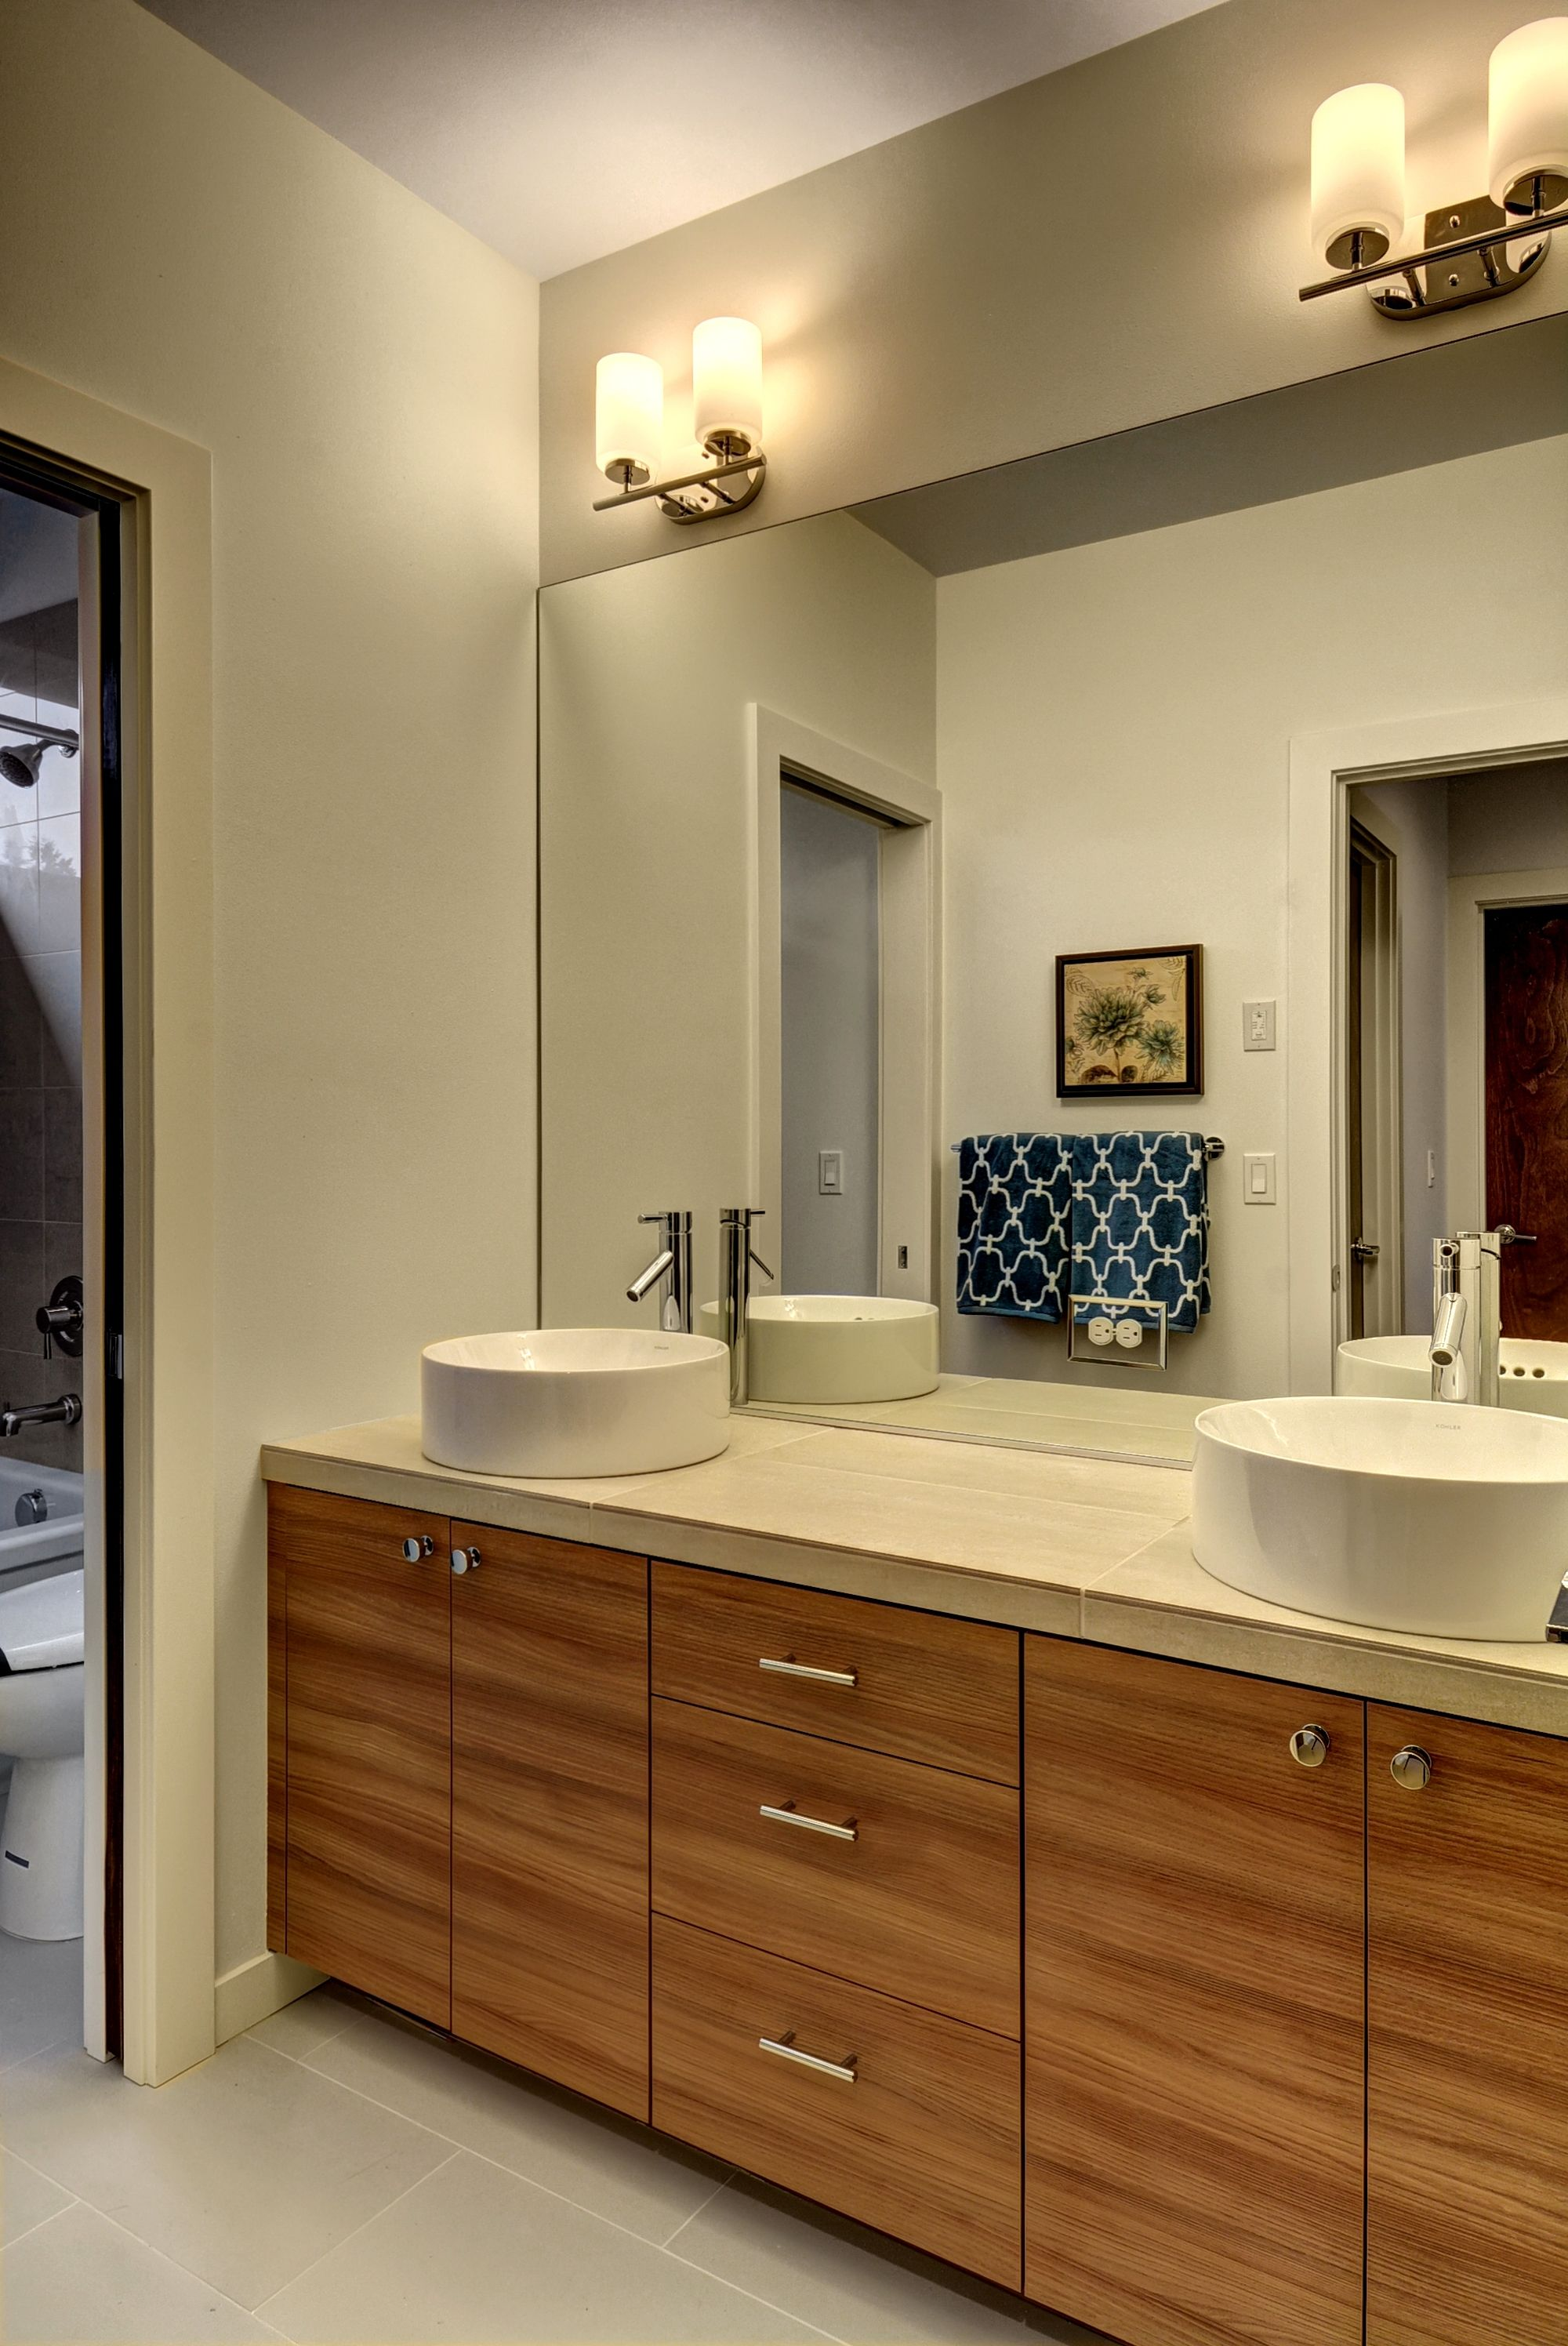 Seattle Built Green Master Bathroom Modern Design Architecture Classy Bathroom Design Seattle Decorating Design